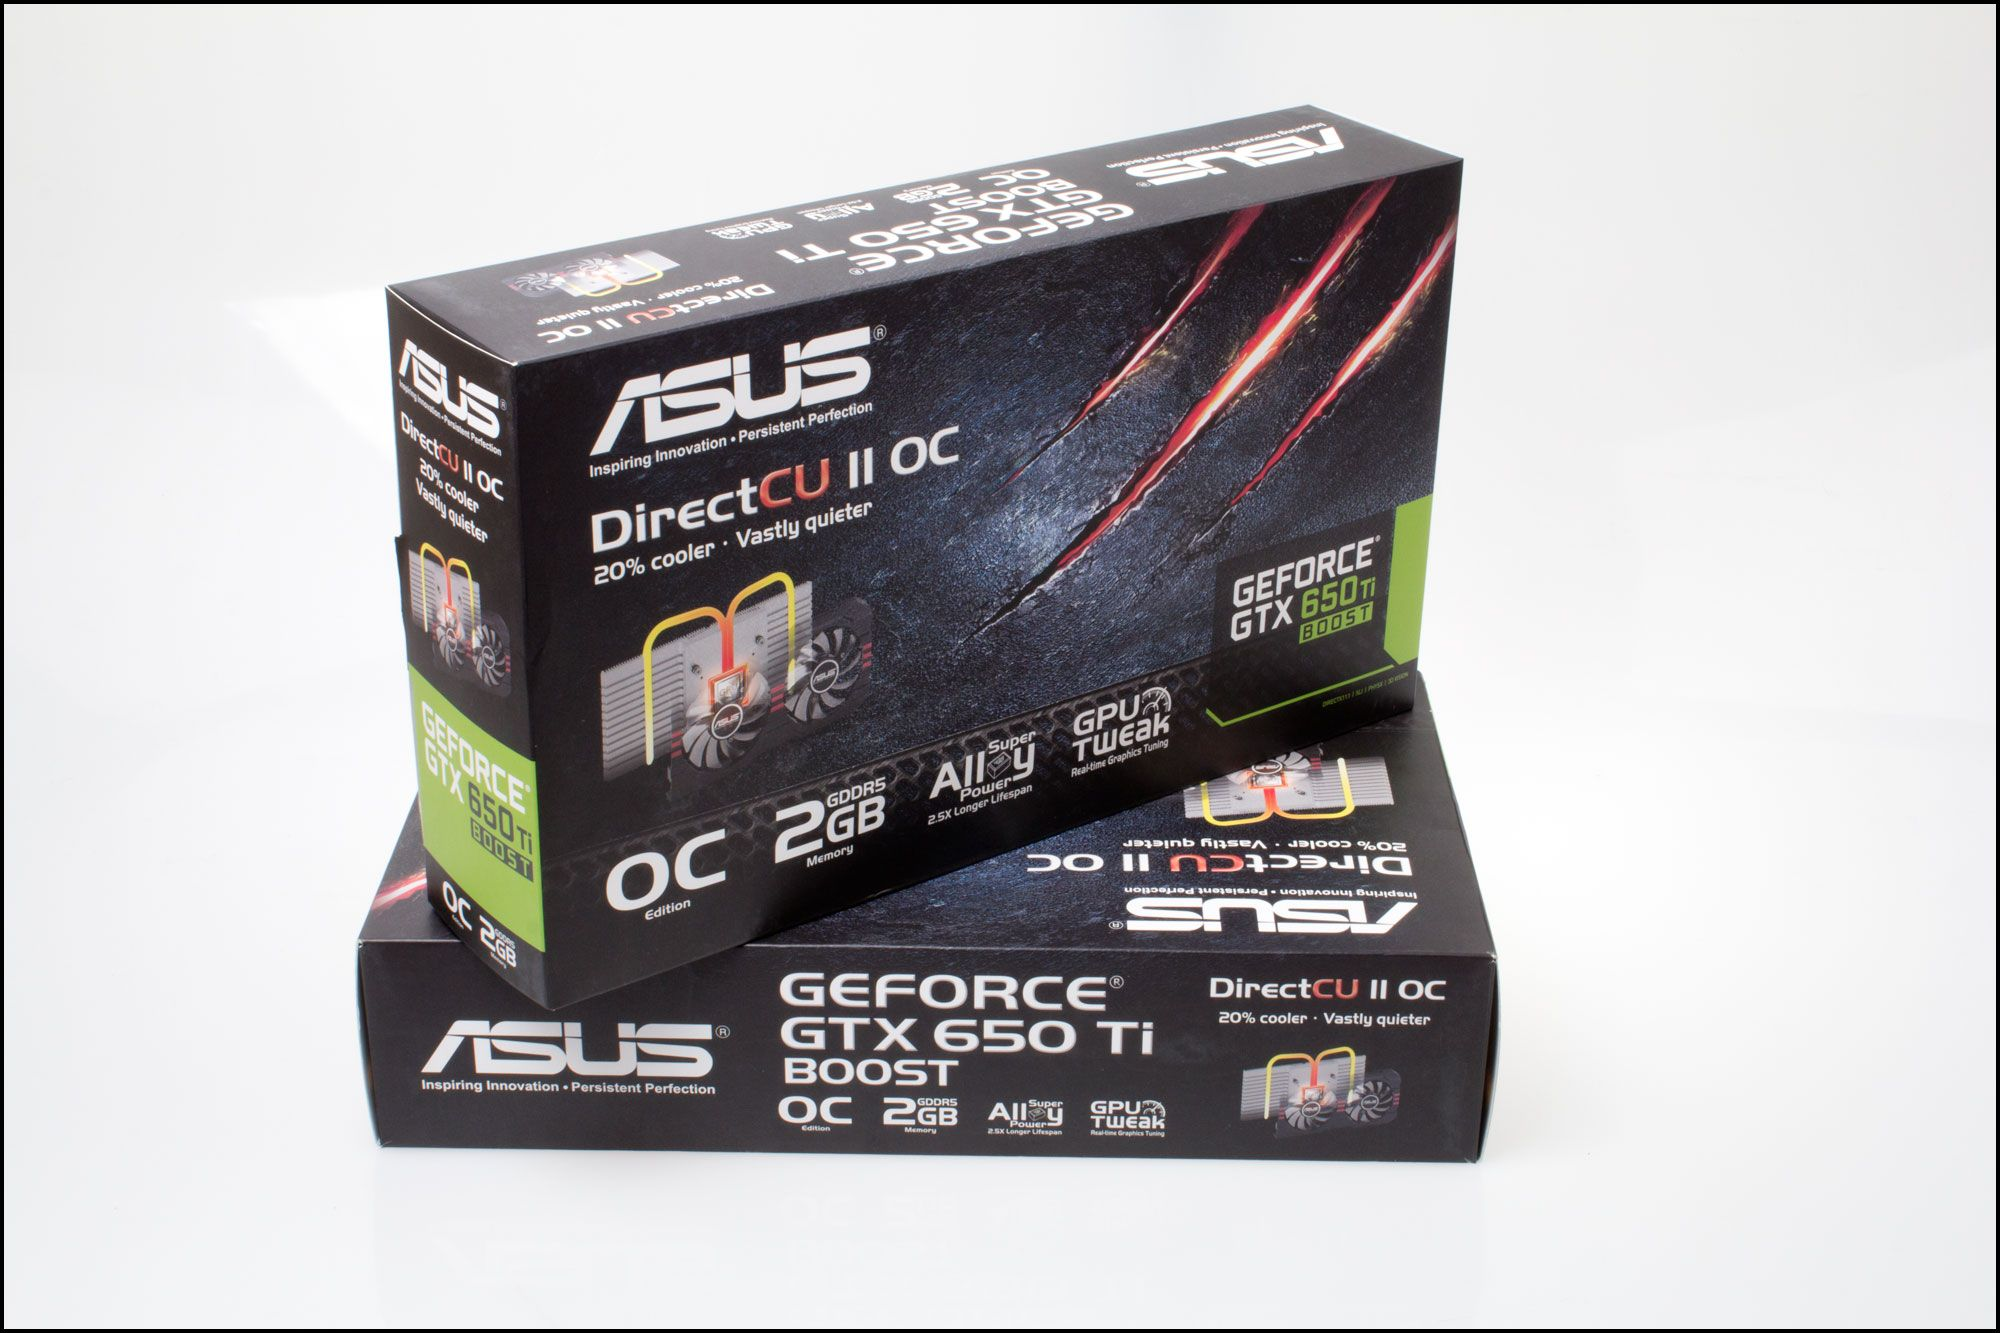 Asus GeForce GTX 650Ti BOOST DirectCU II OC: Produktesker.Foto: Varg Aamo, Hardware.no